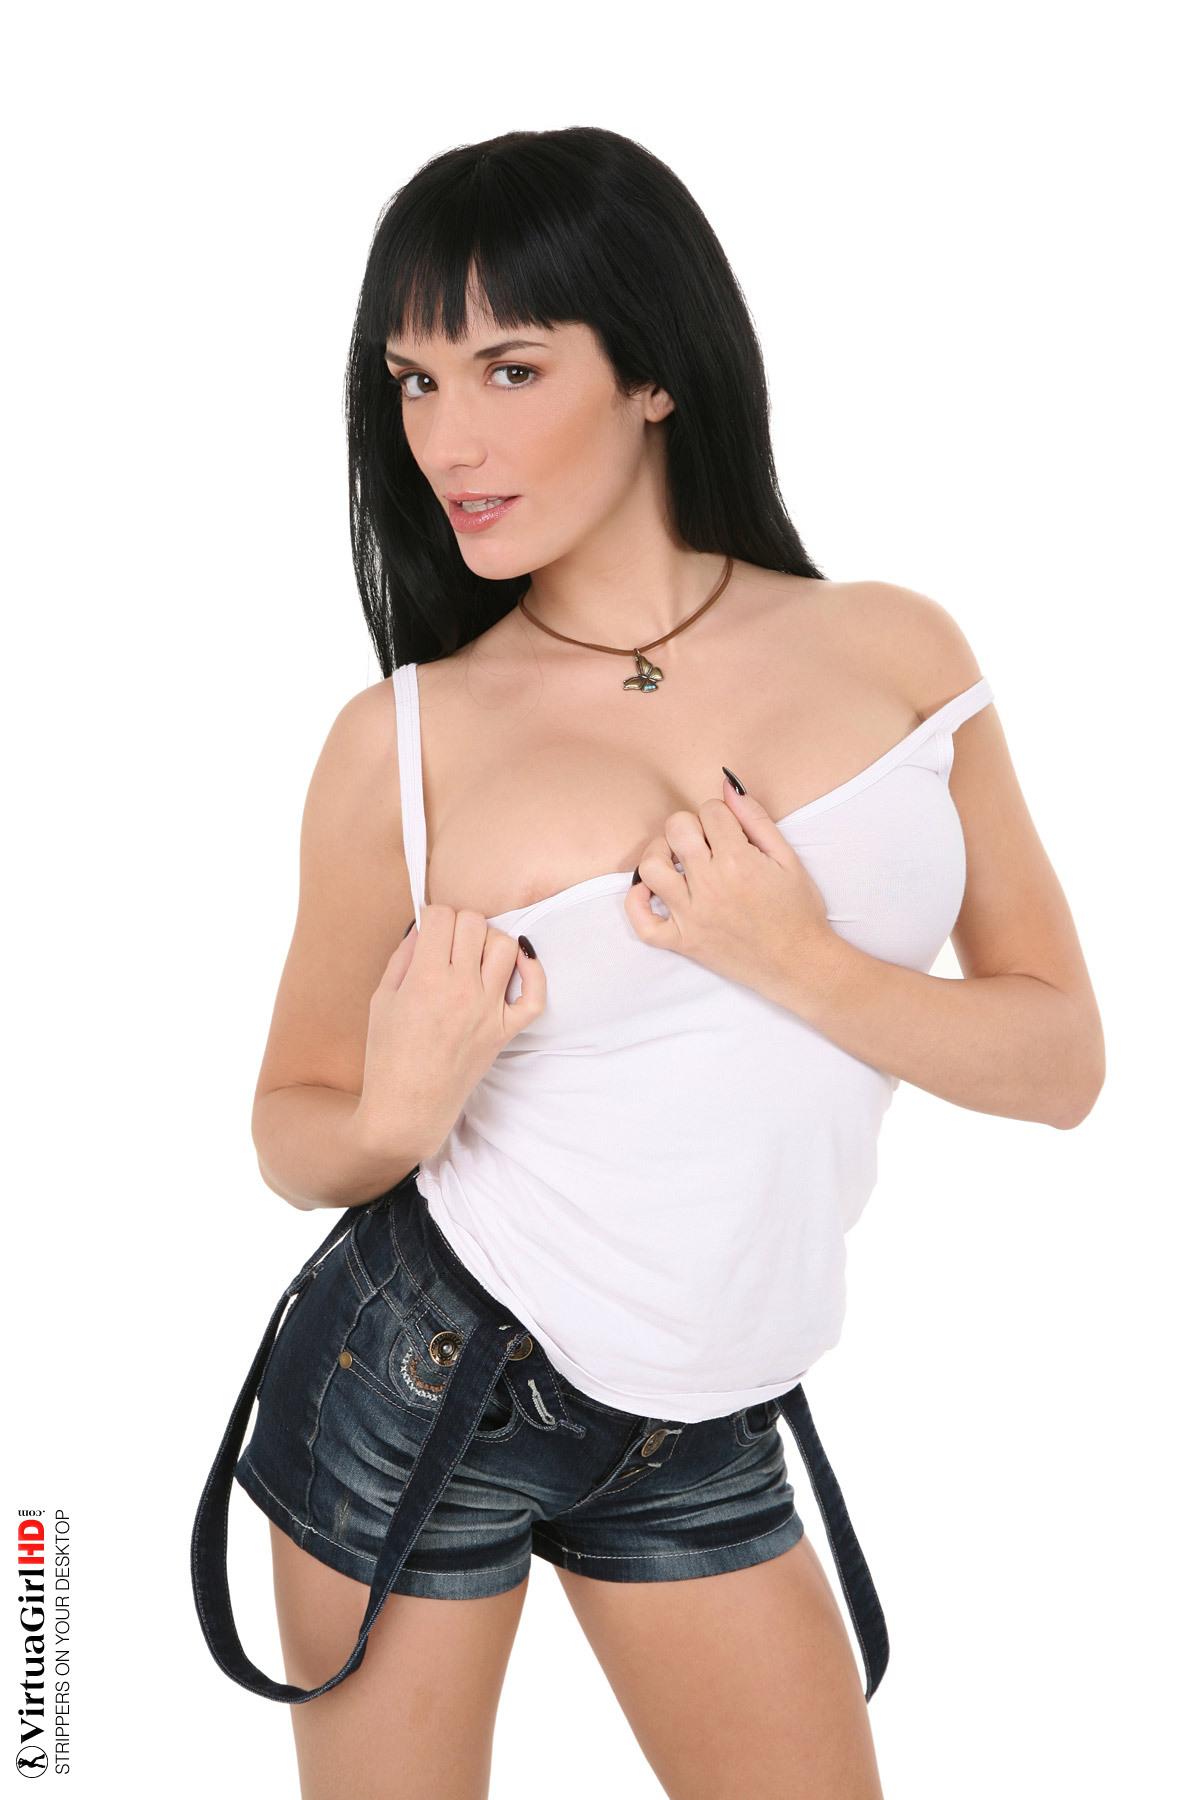 hot girls stripping hentai